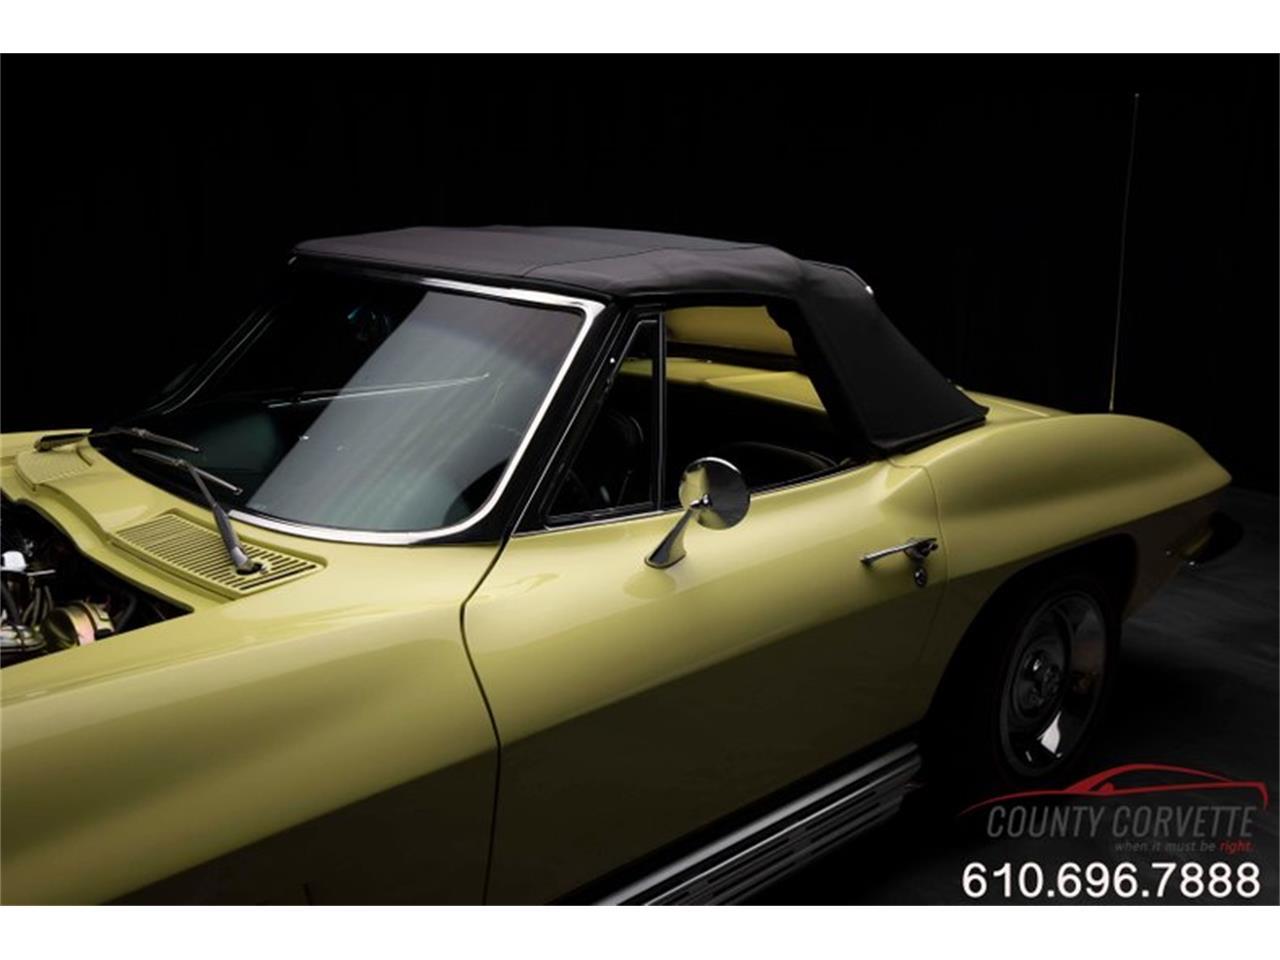 1967 Chevrolet Corvette (CC-1410251) for sale in West Chester, Pennsylvania